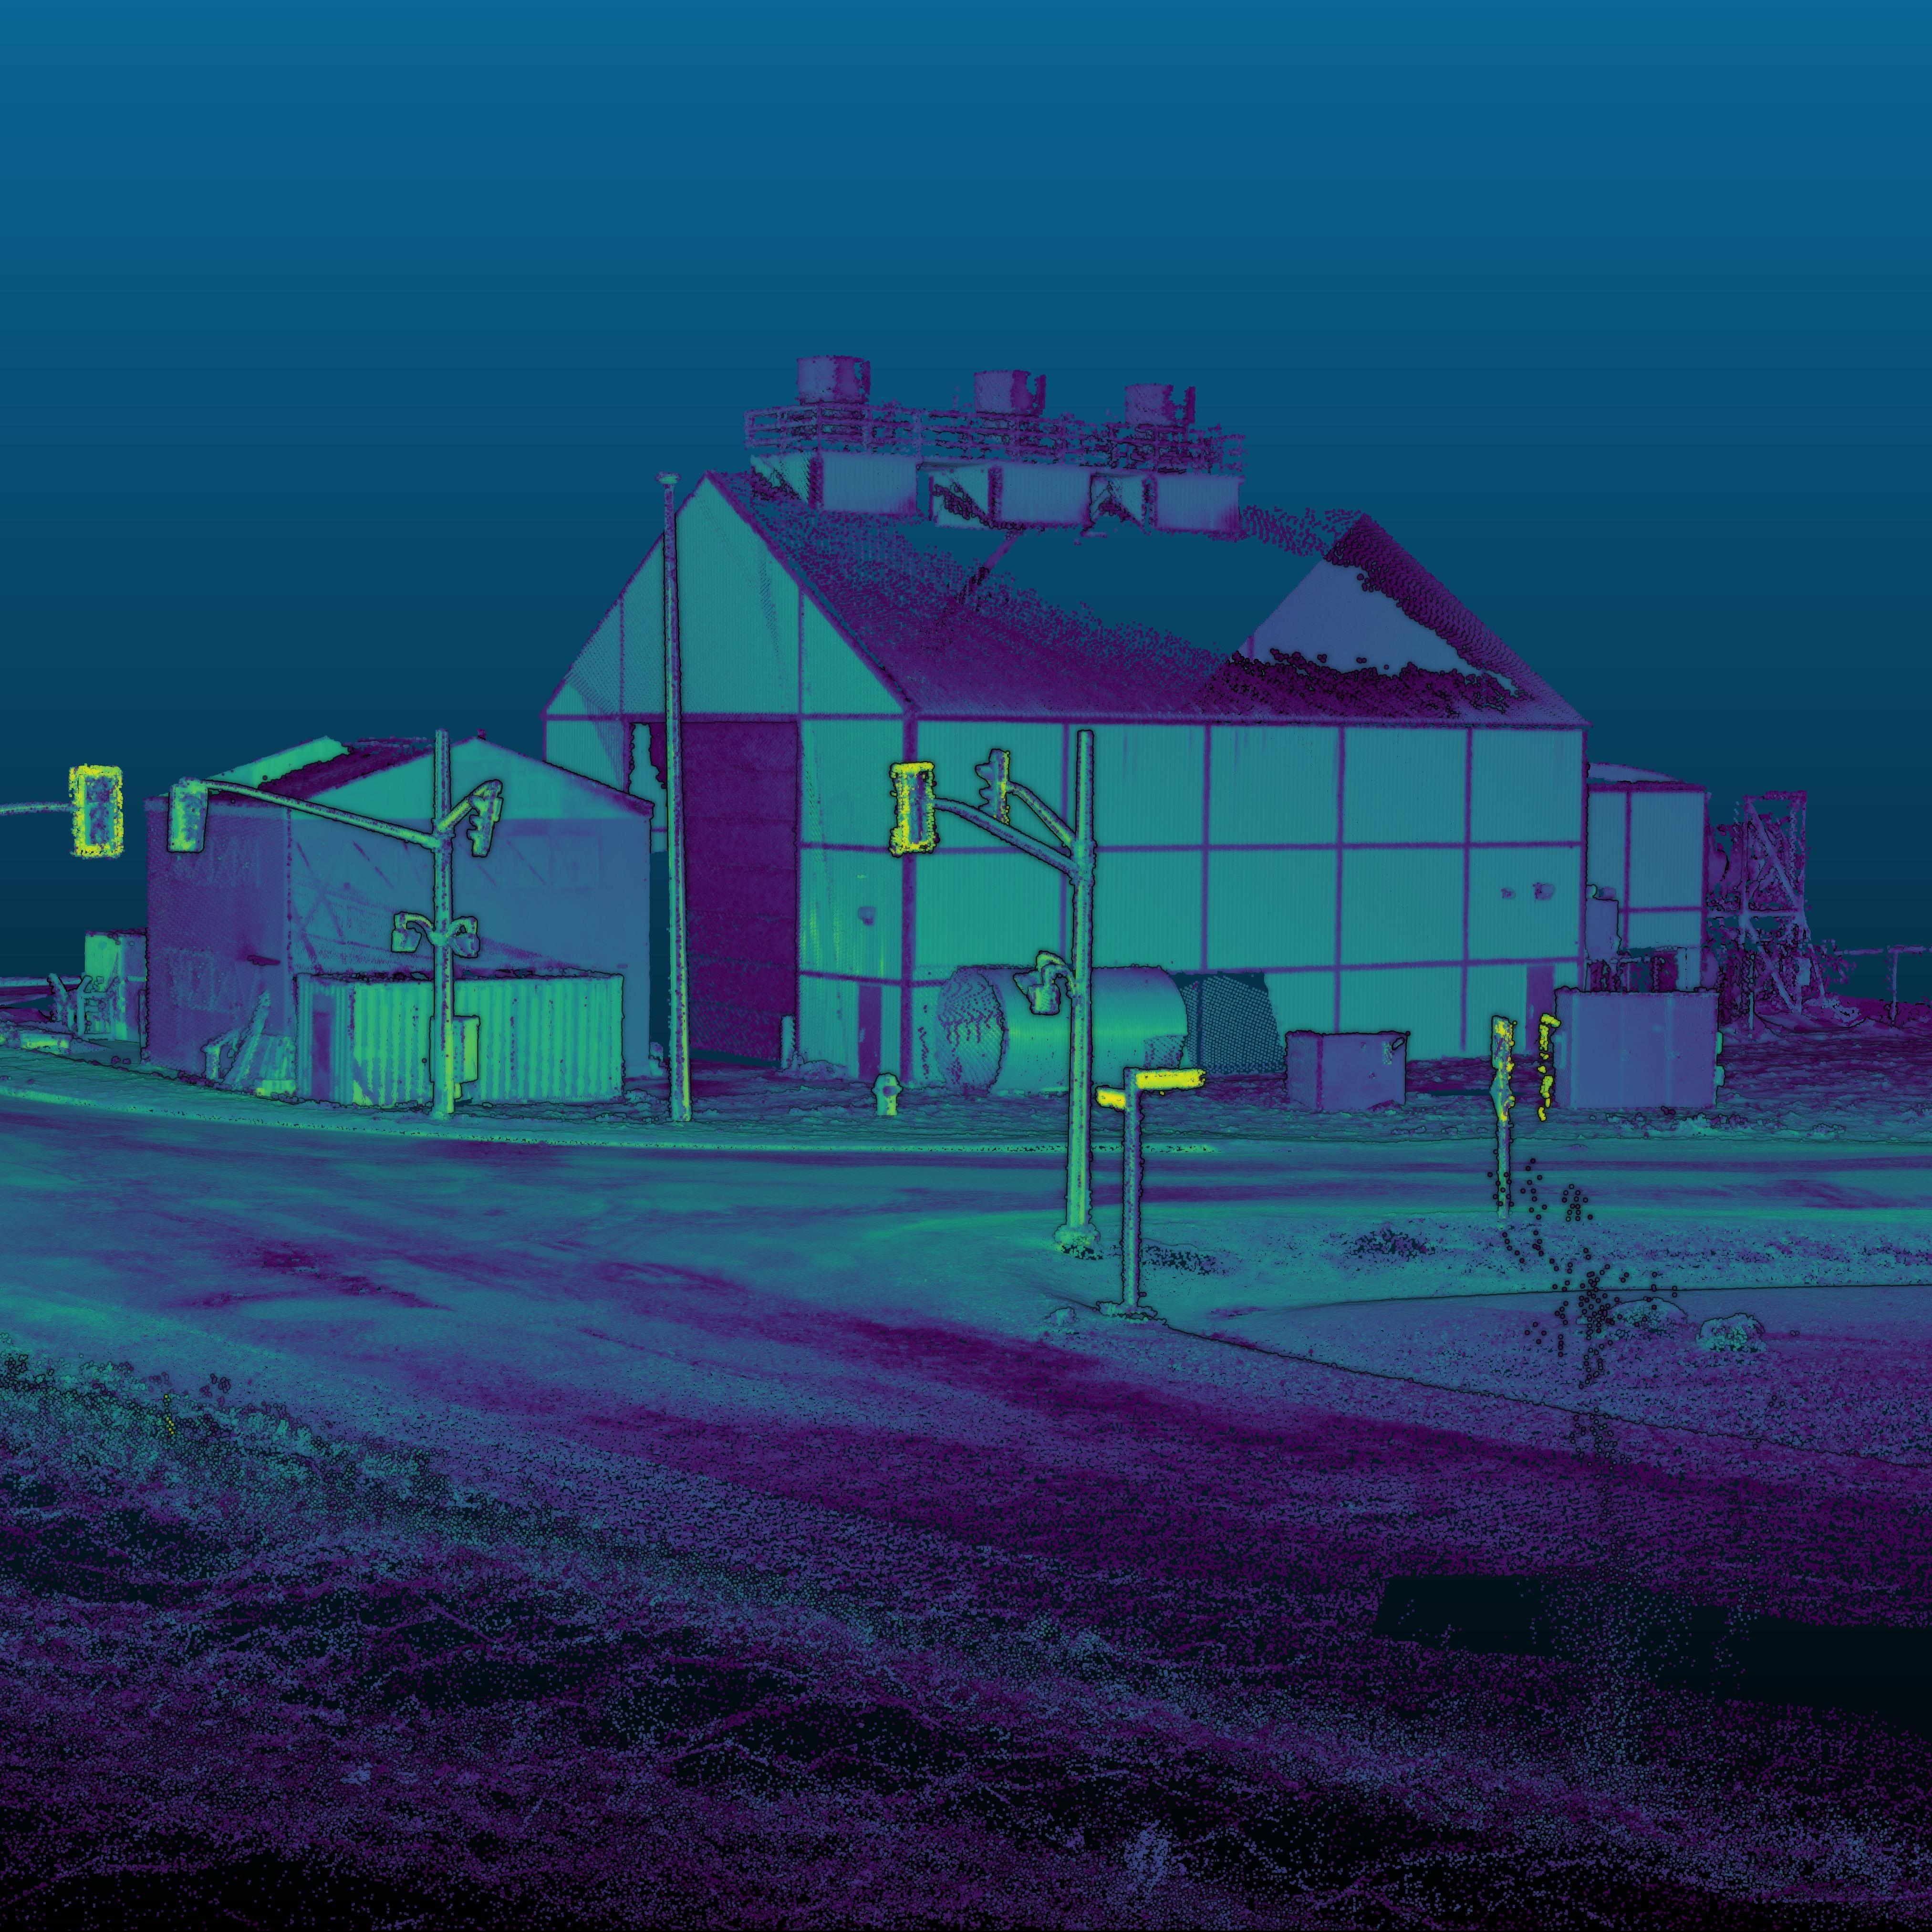 3D geospatial data